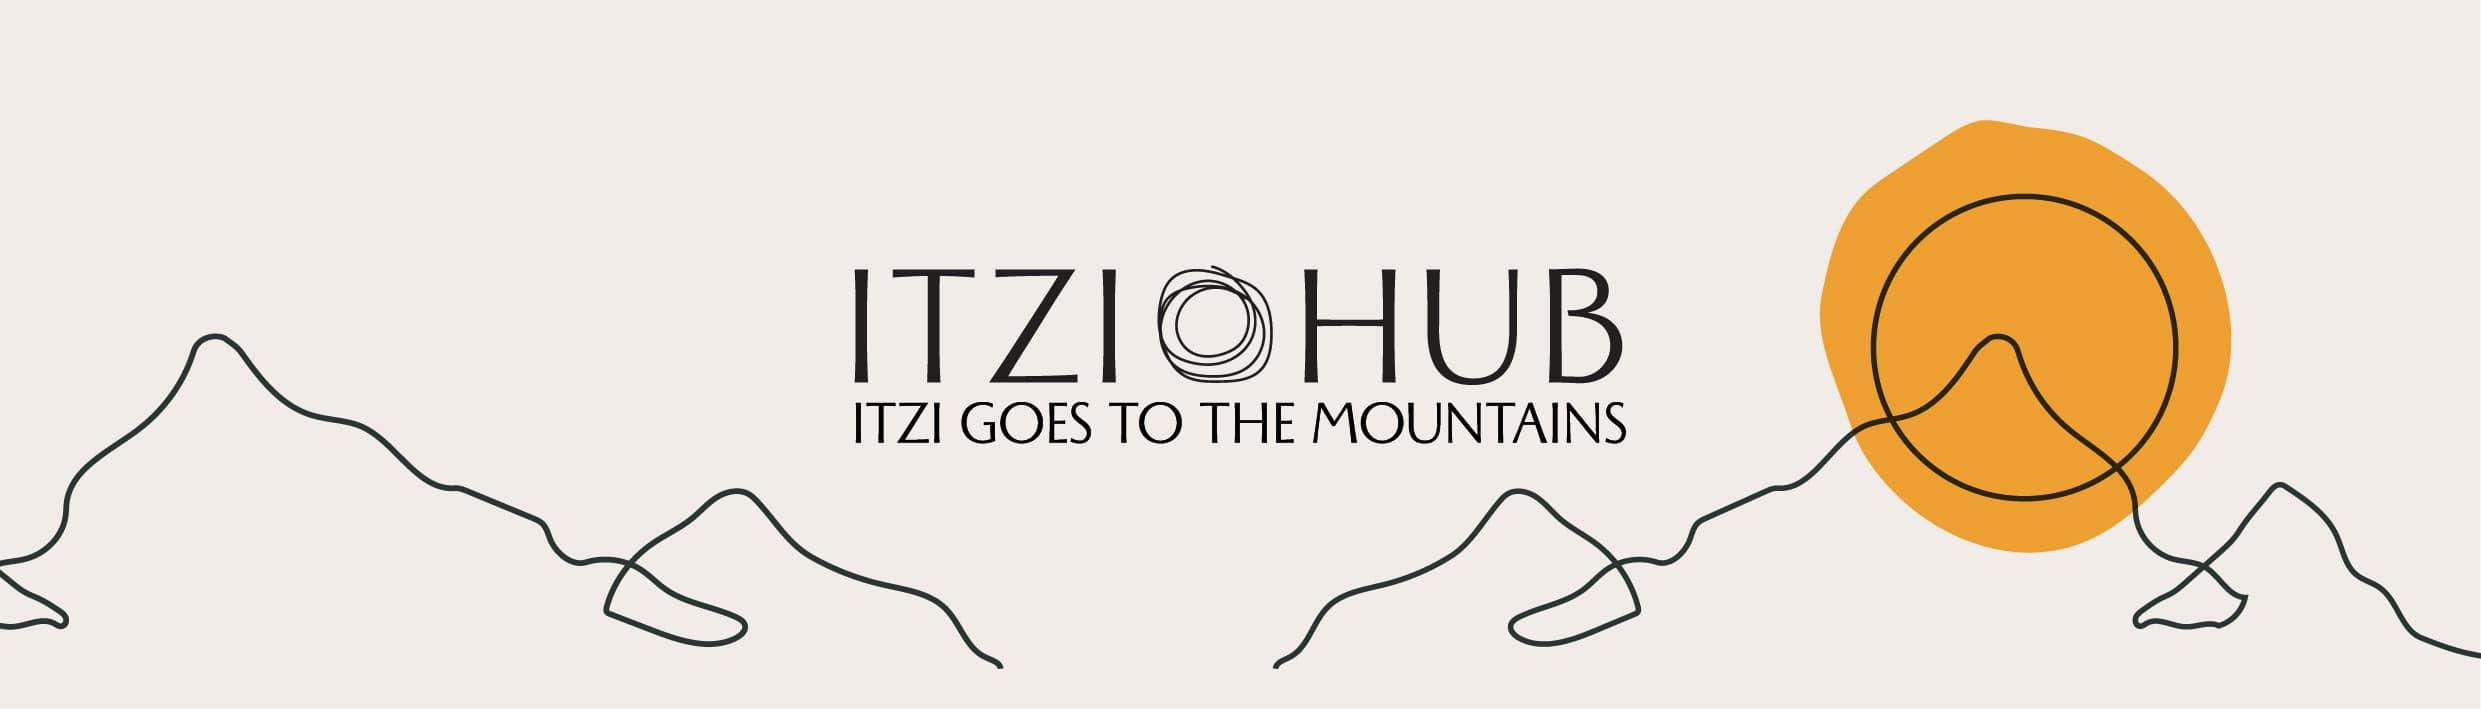 ITZI HUB goes to the mountains news_ ITZI HUB il luogo sicuro per i tuoi regali